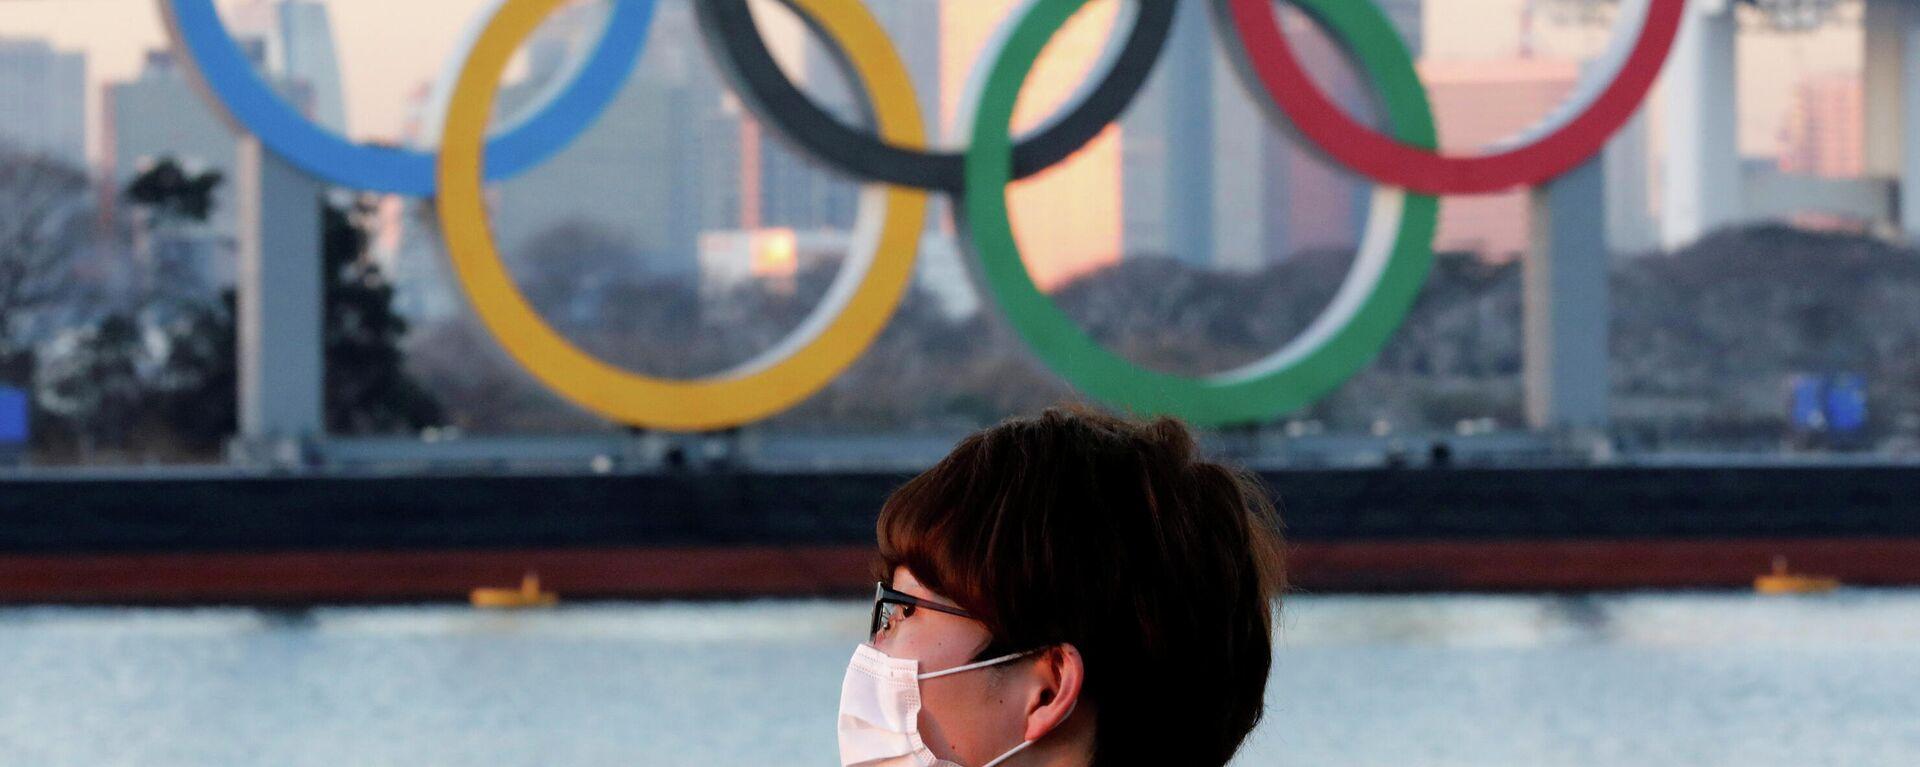 Olympisches Dorf in Tokio, 13. Januar 2021 - SNA, 1920, 27.01.2021